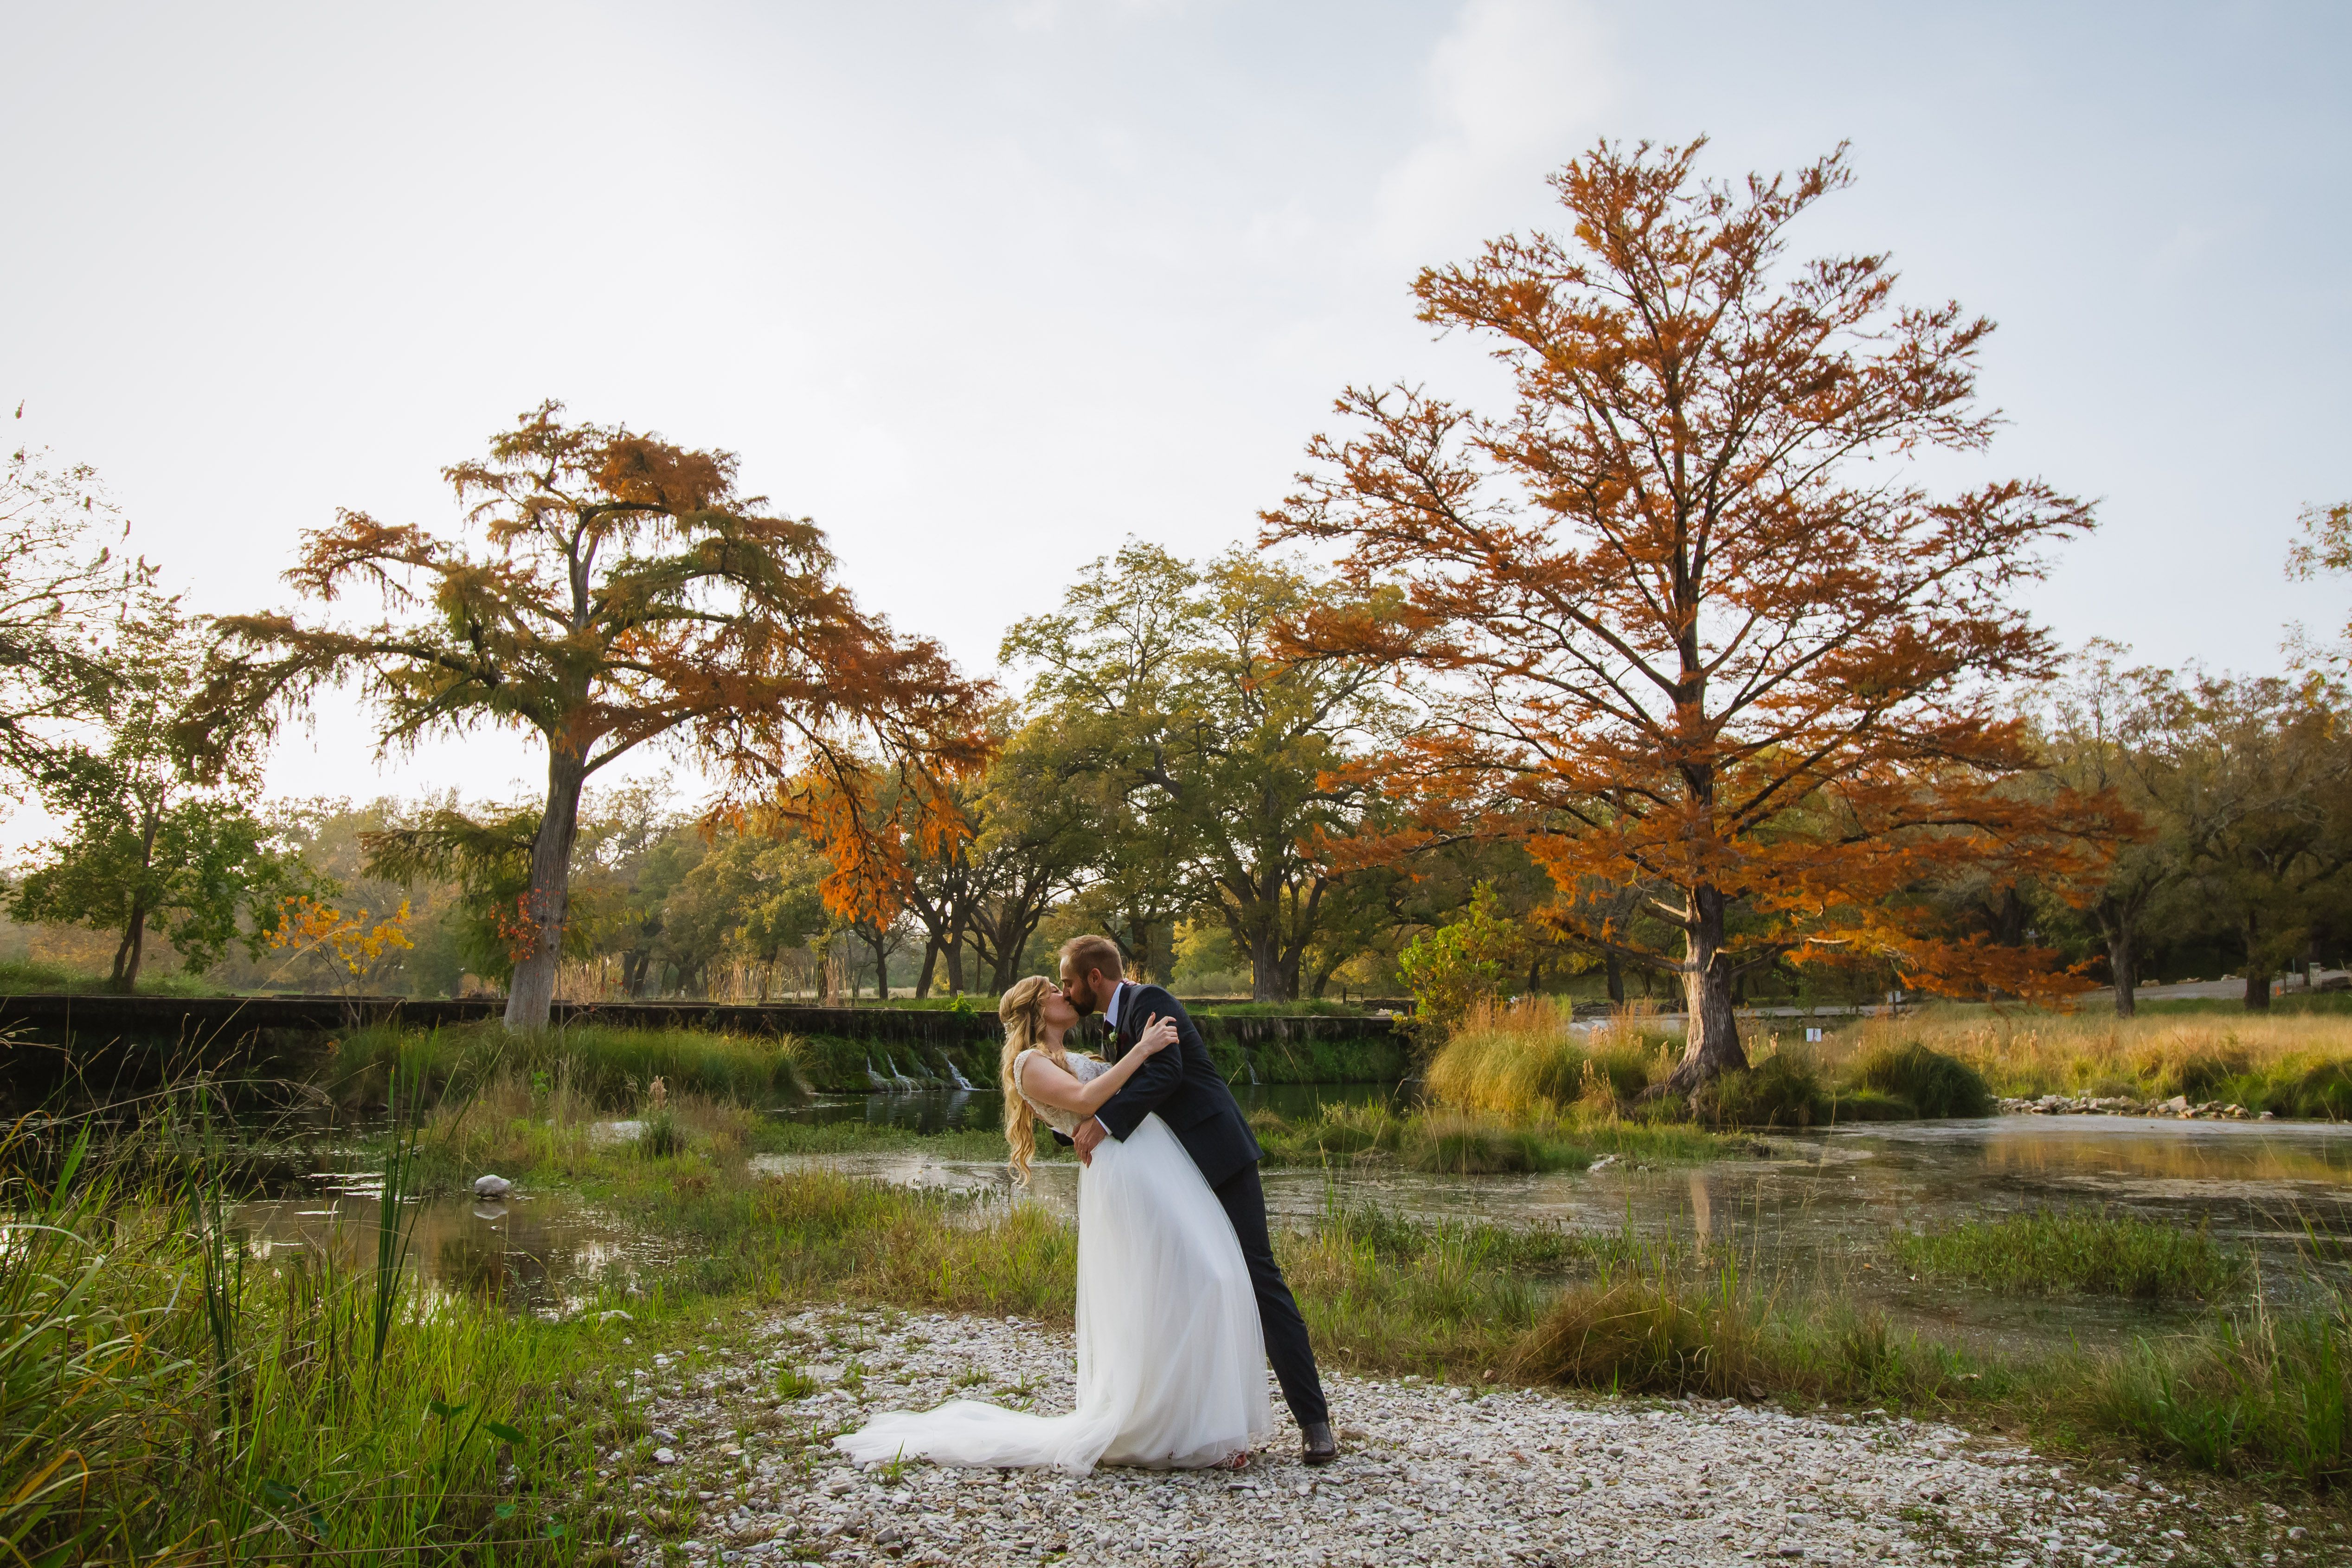 Outdoor weddings are the best weddings. - - # ...